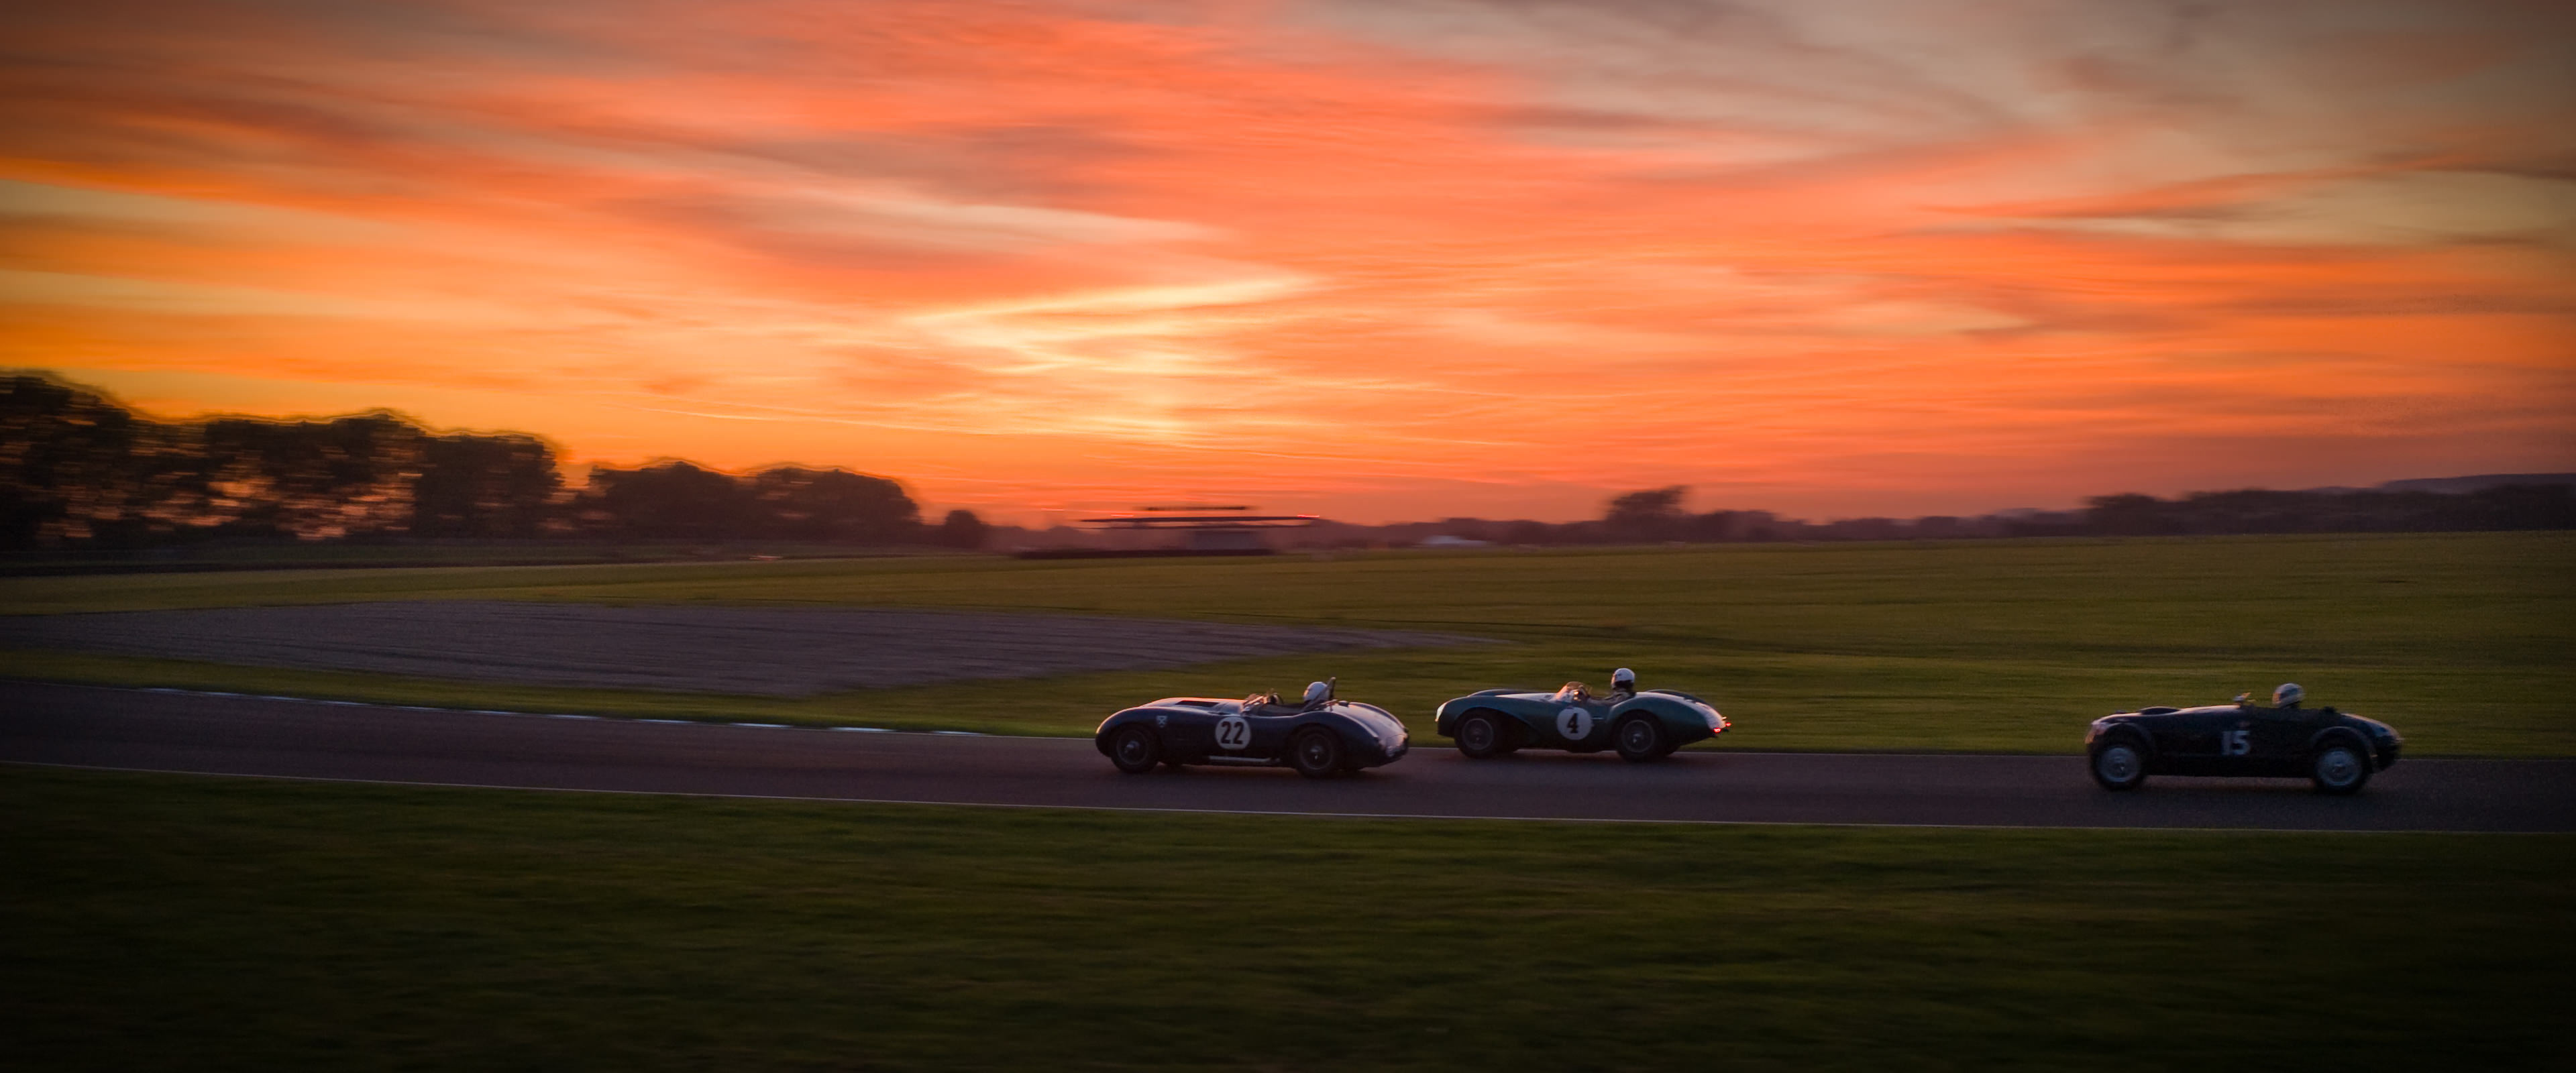 Wayfinder Workshop Hero Goodwood Revival Night Race Cars By Brett Leica Photographer